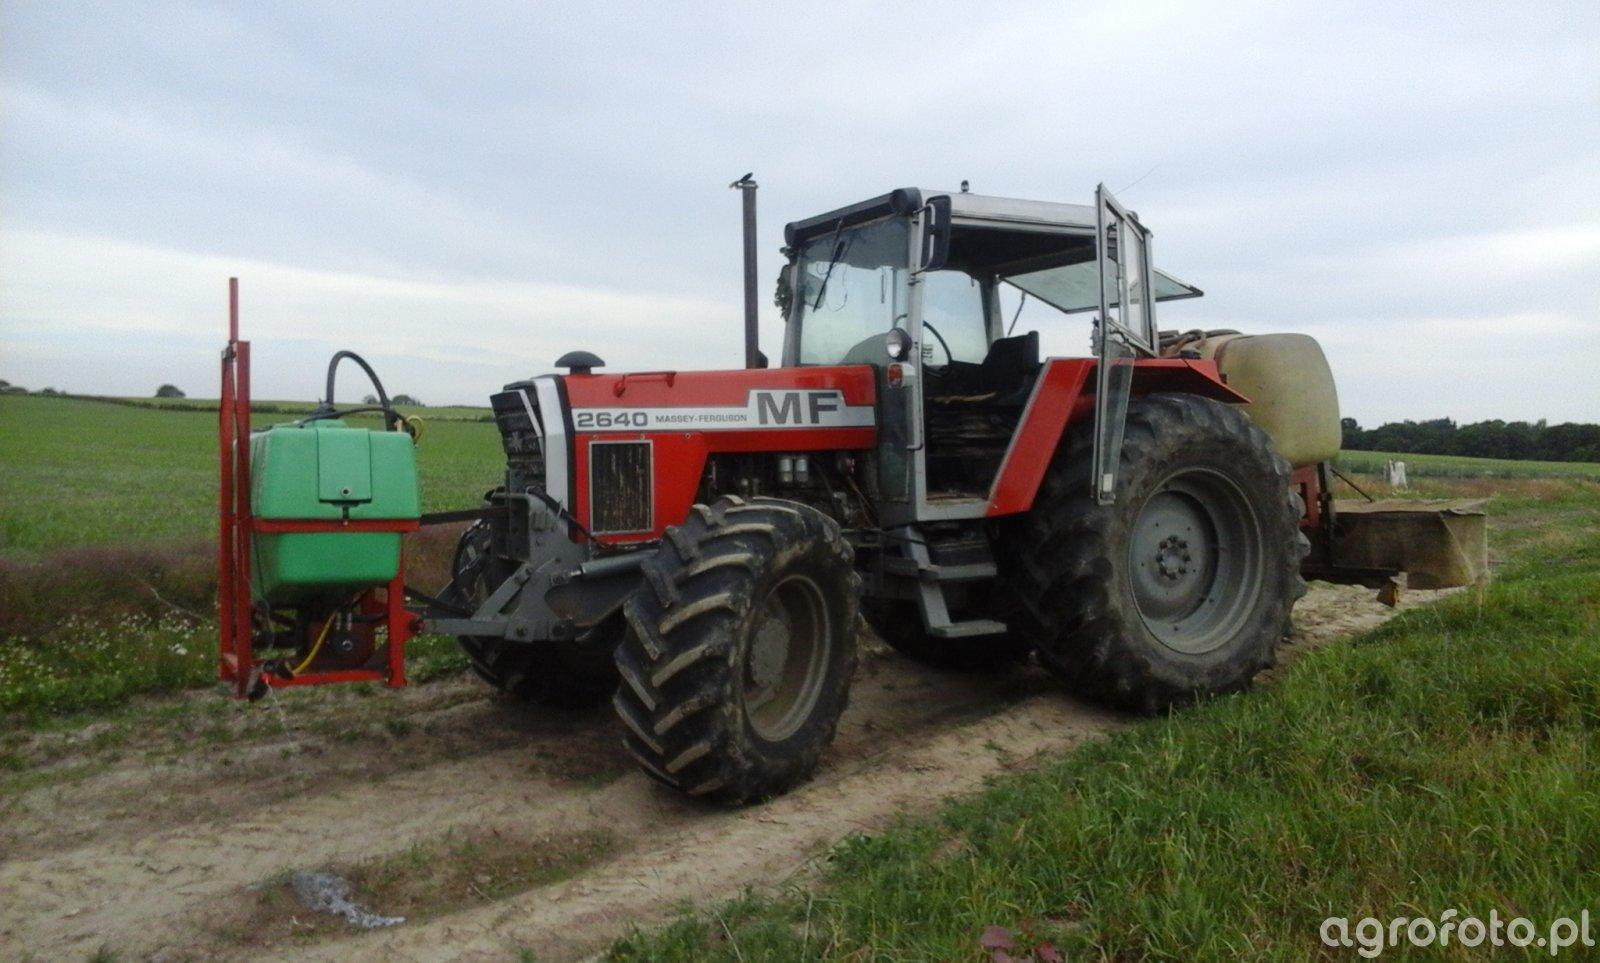 MF 2640